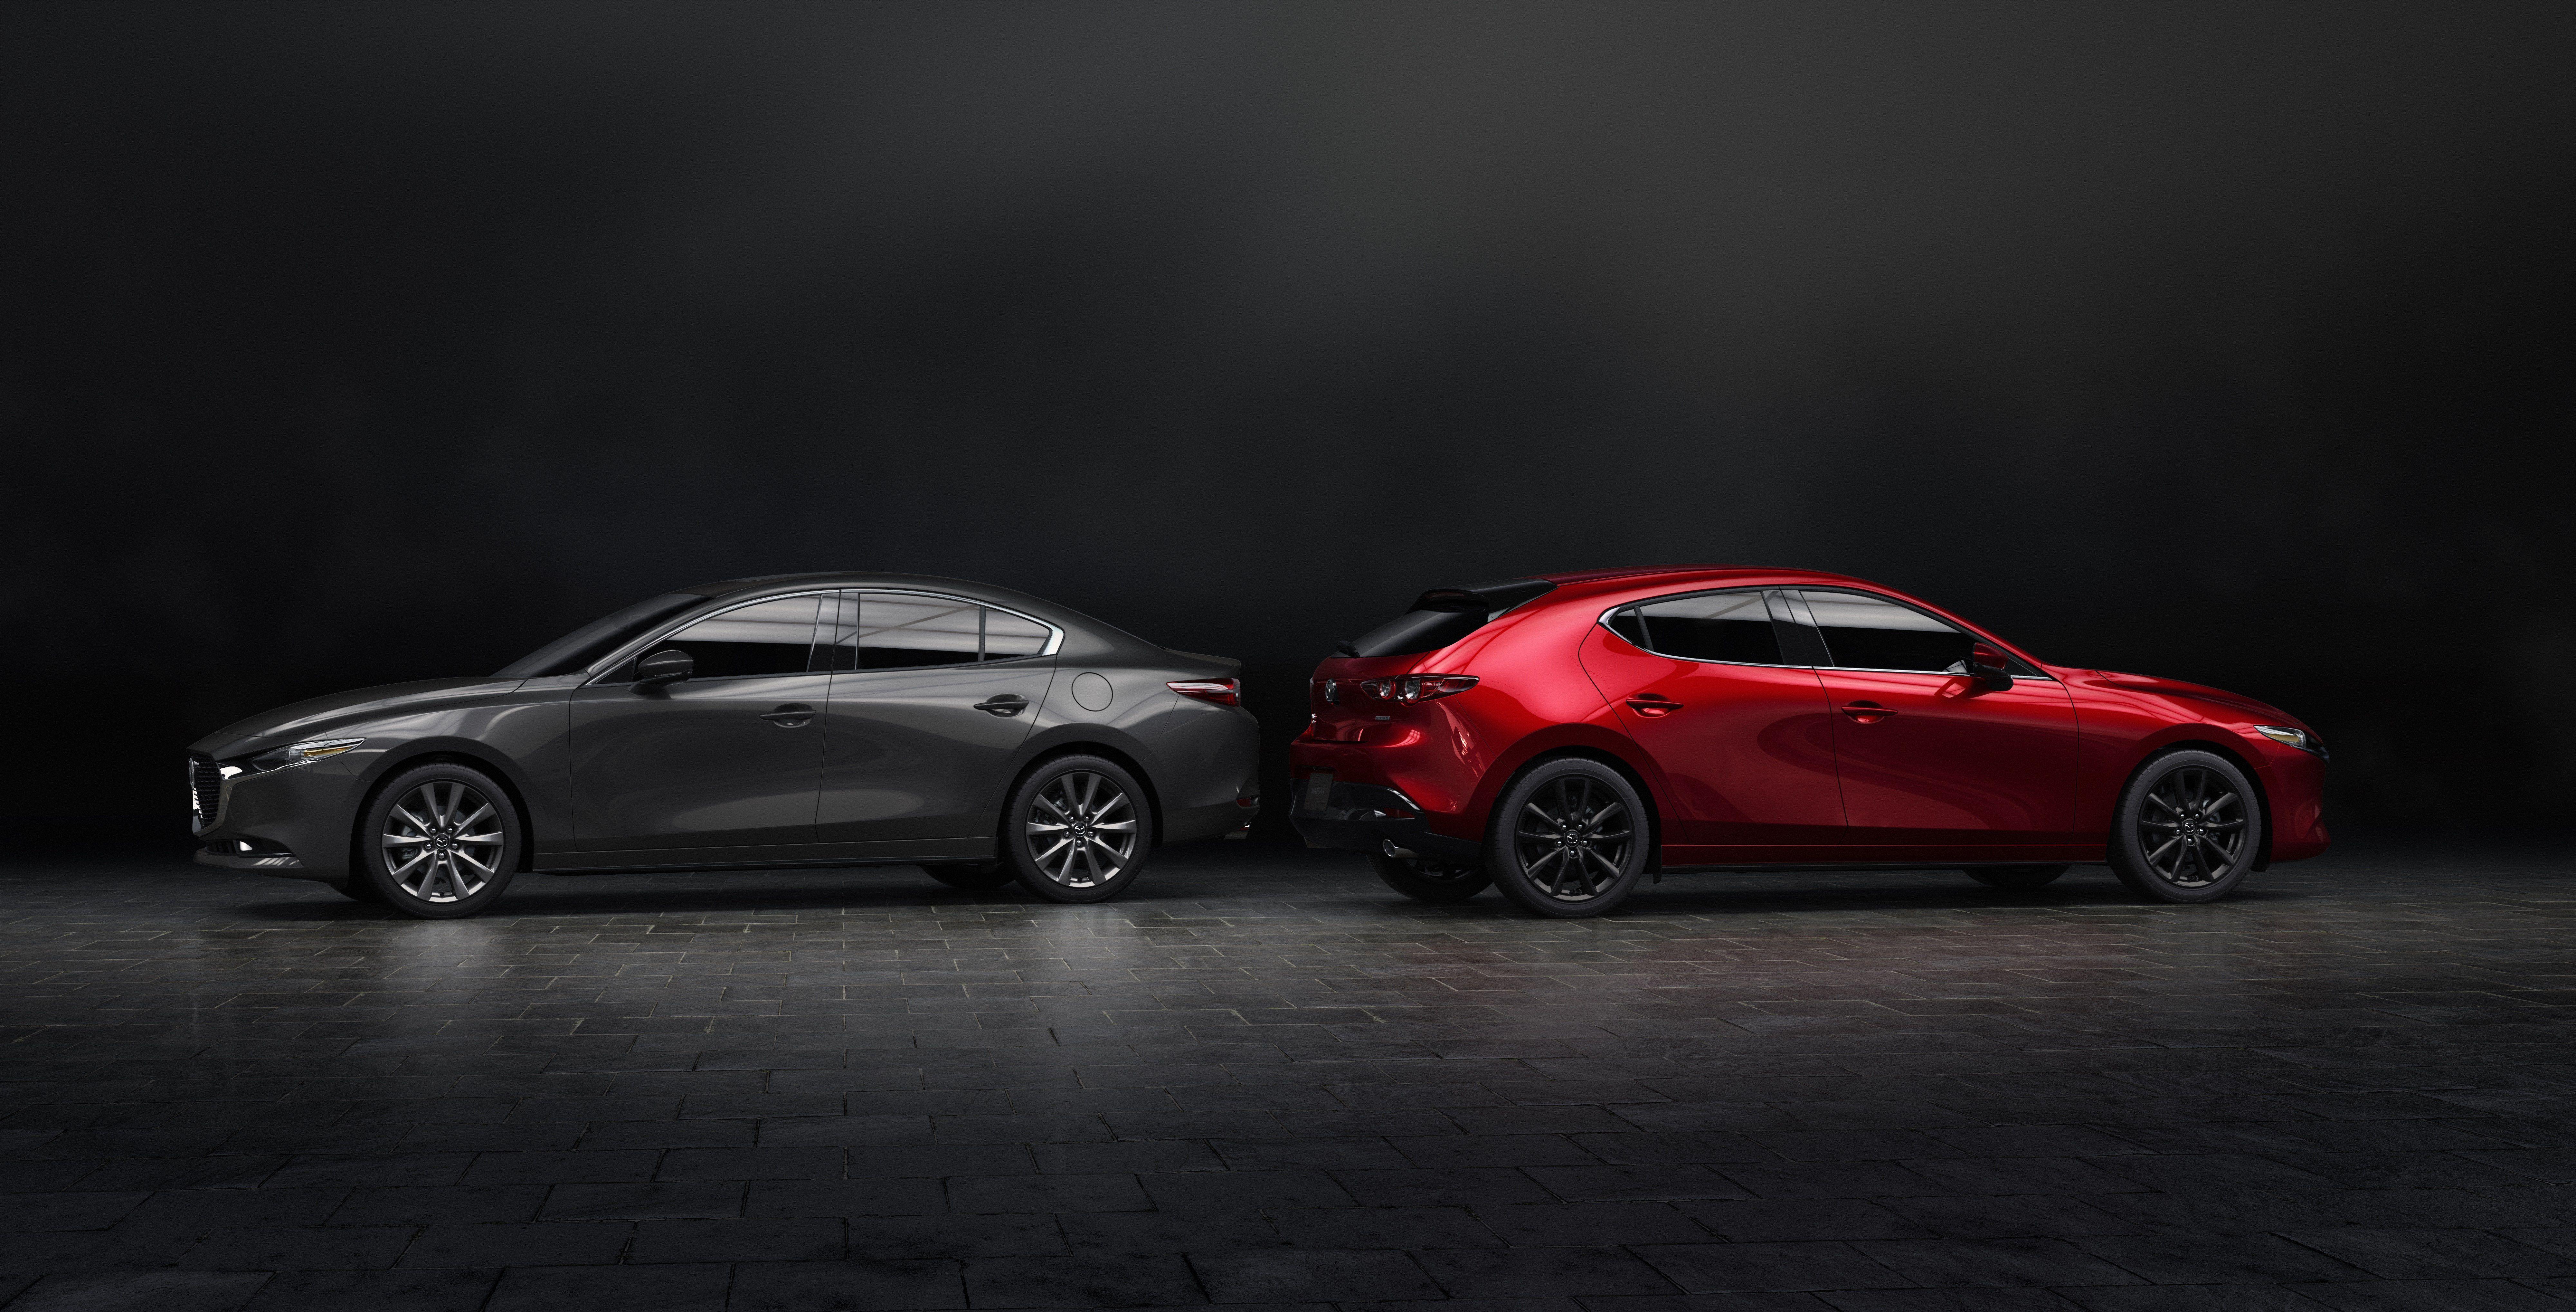 Mazda 3 Sport Vs Touring >> New 2019 Mazda 3 Sedan And Hatchback Priced More Expensive